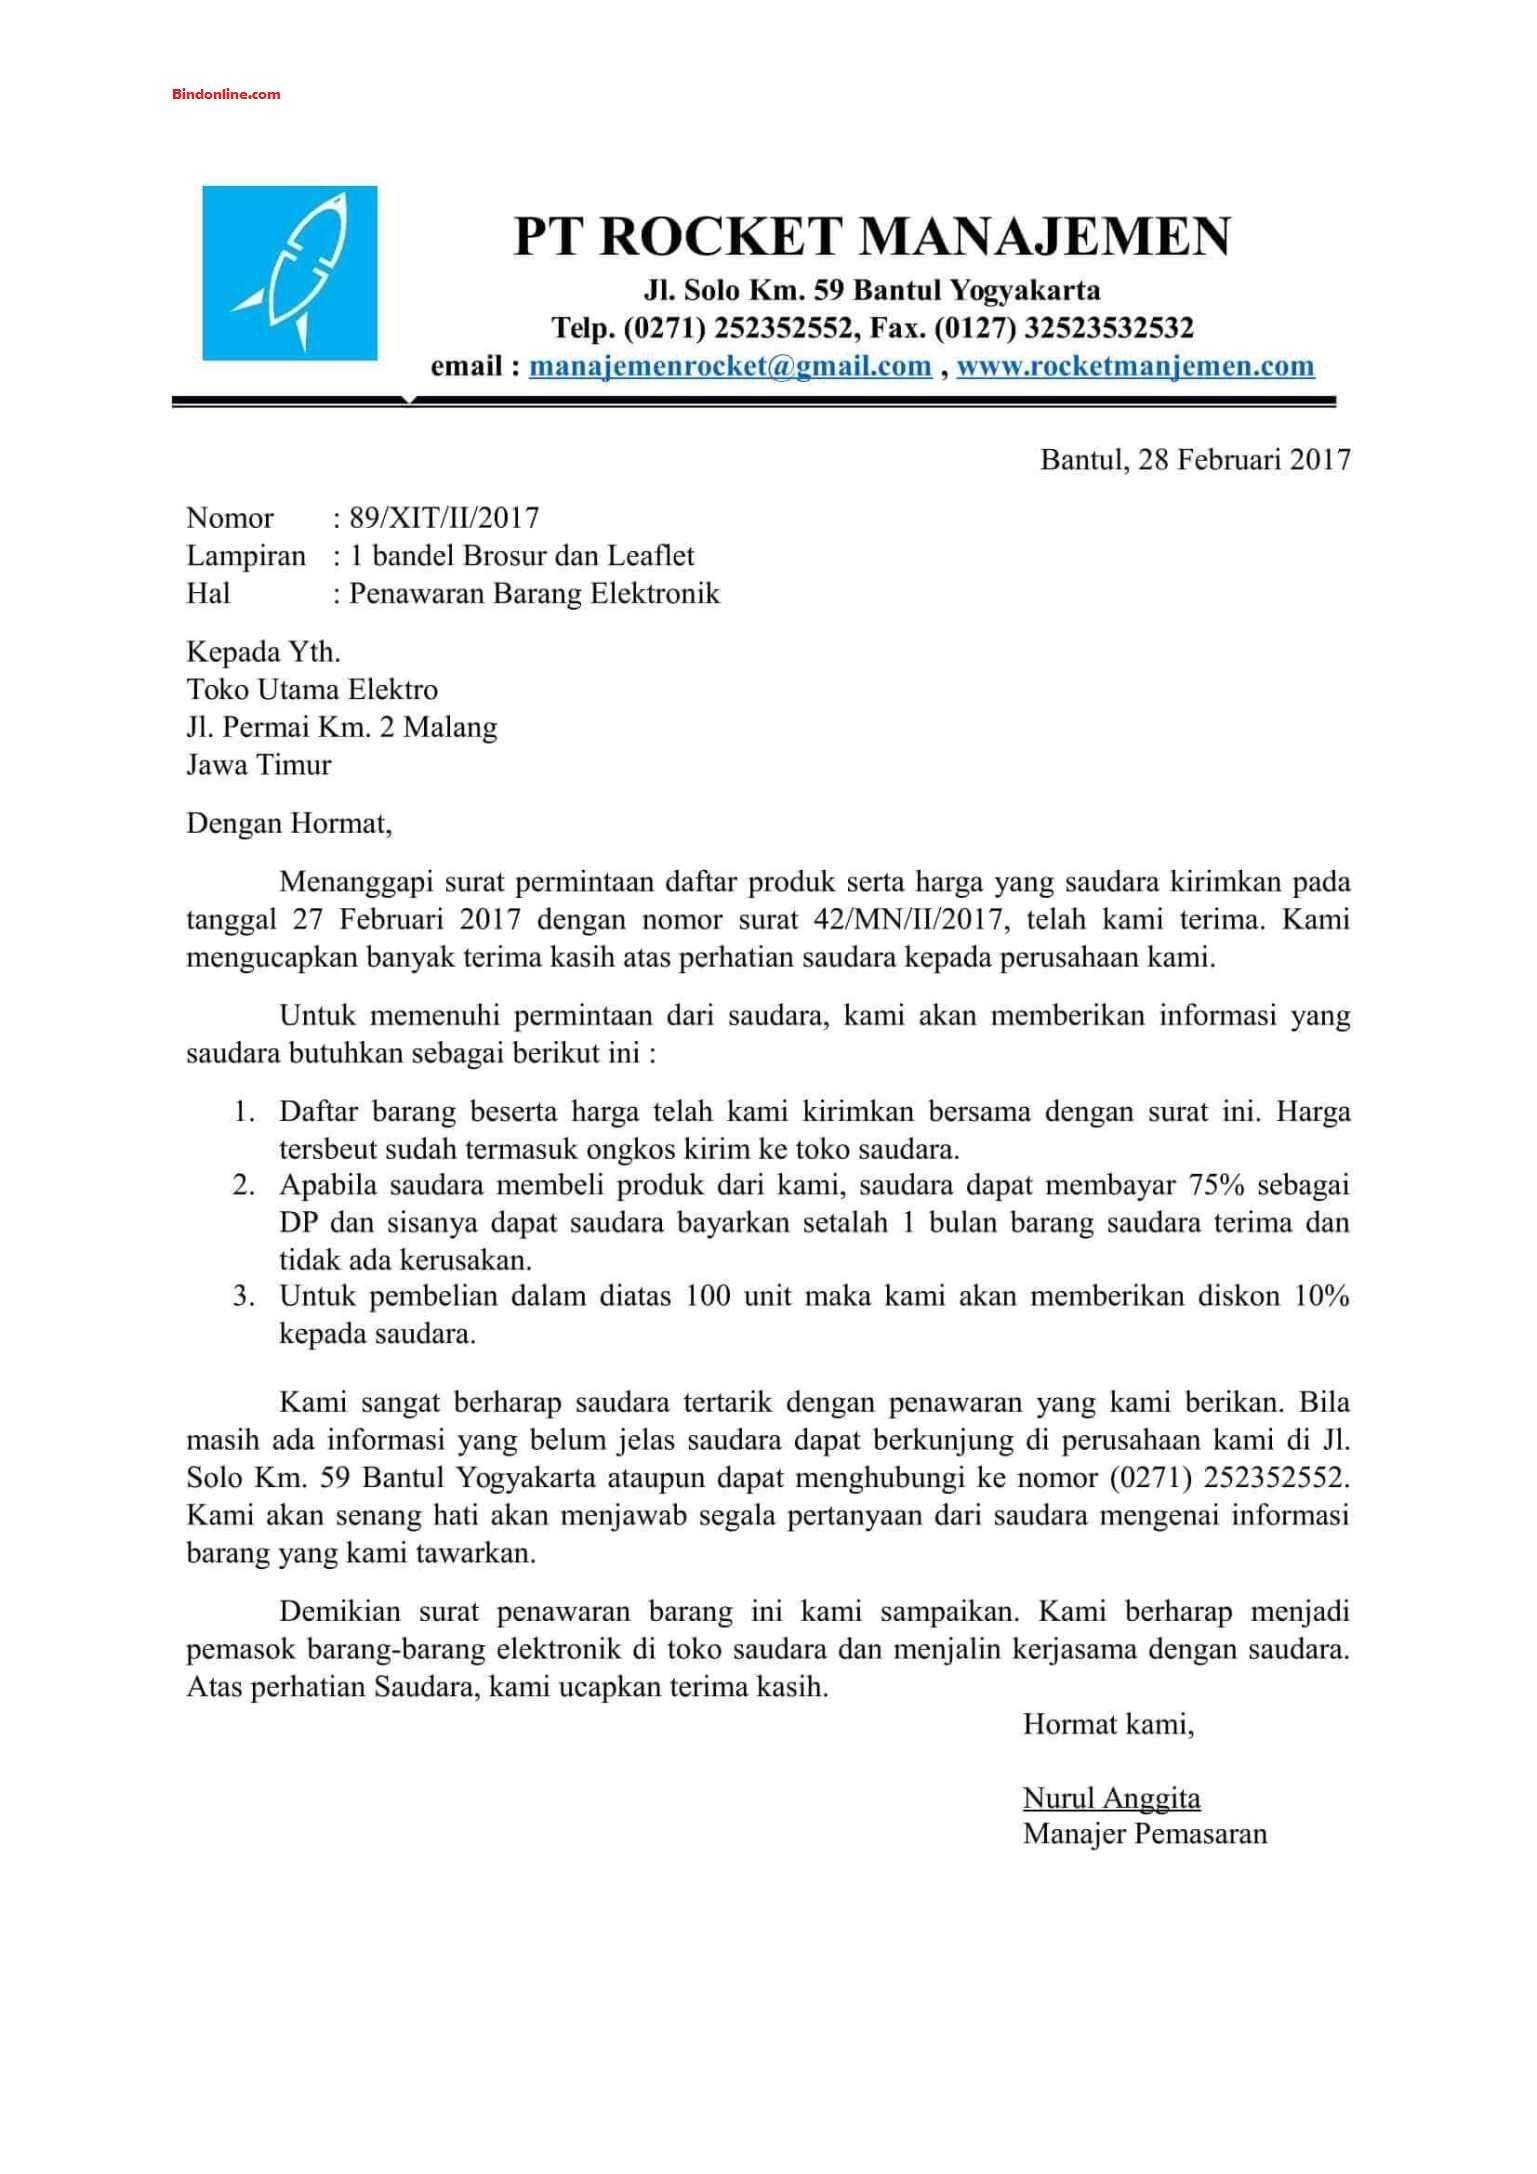 Contoh surat penawaran perusahaan